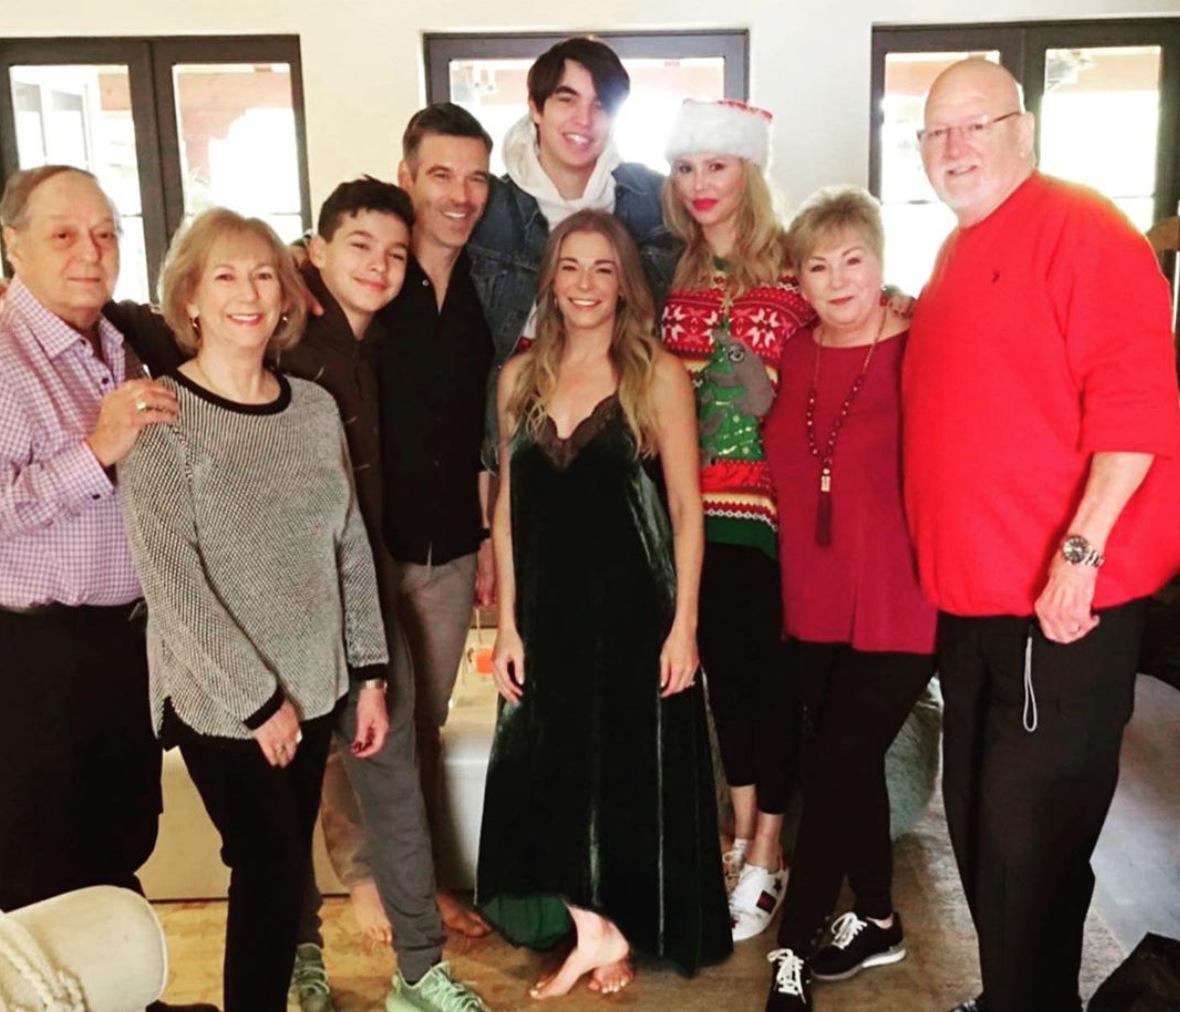 Brandi Glanville Enjoys Christmas With Ex Eddie Cibrian and LeAnn Rimes